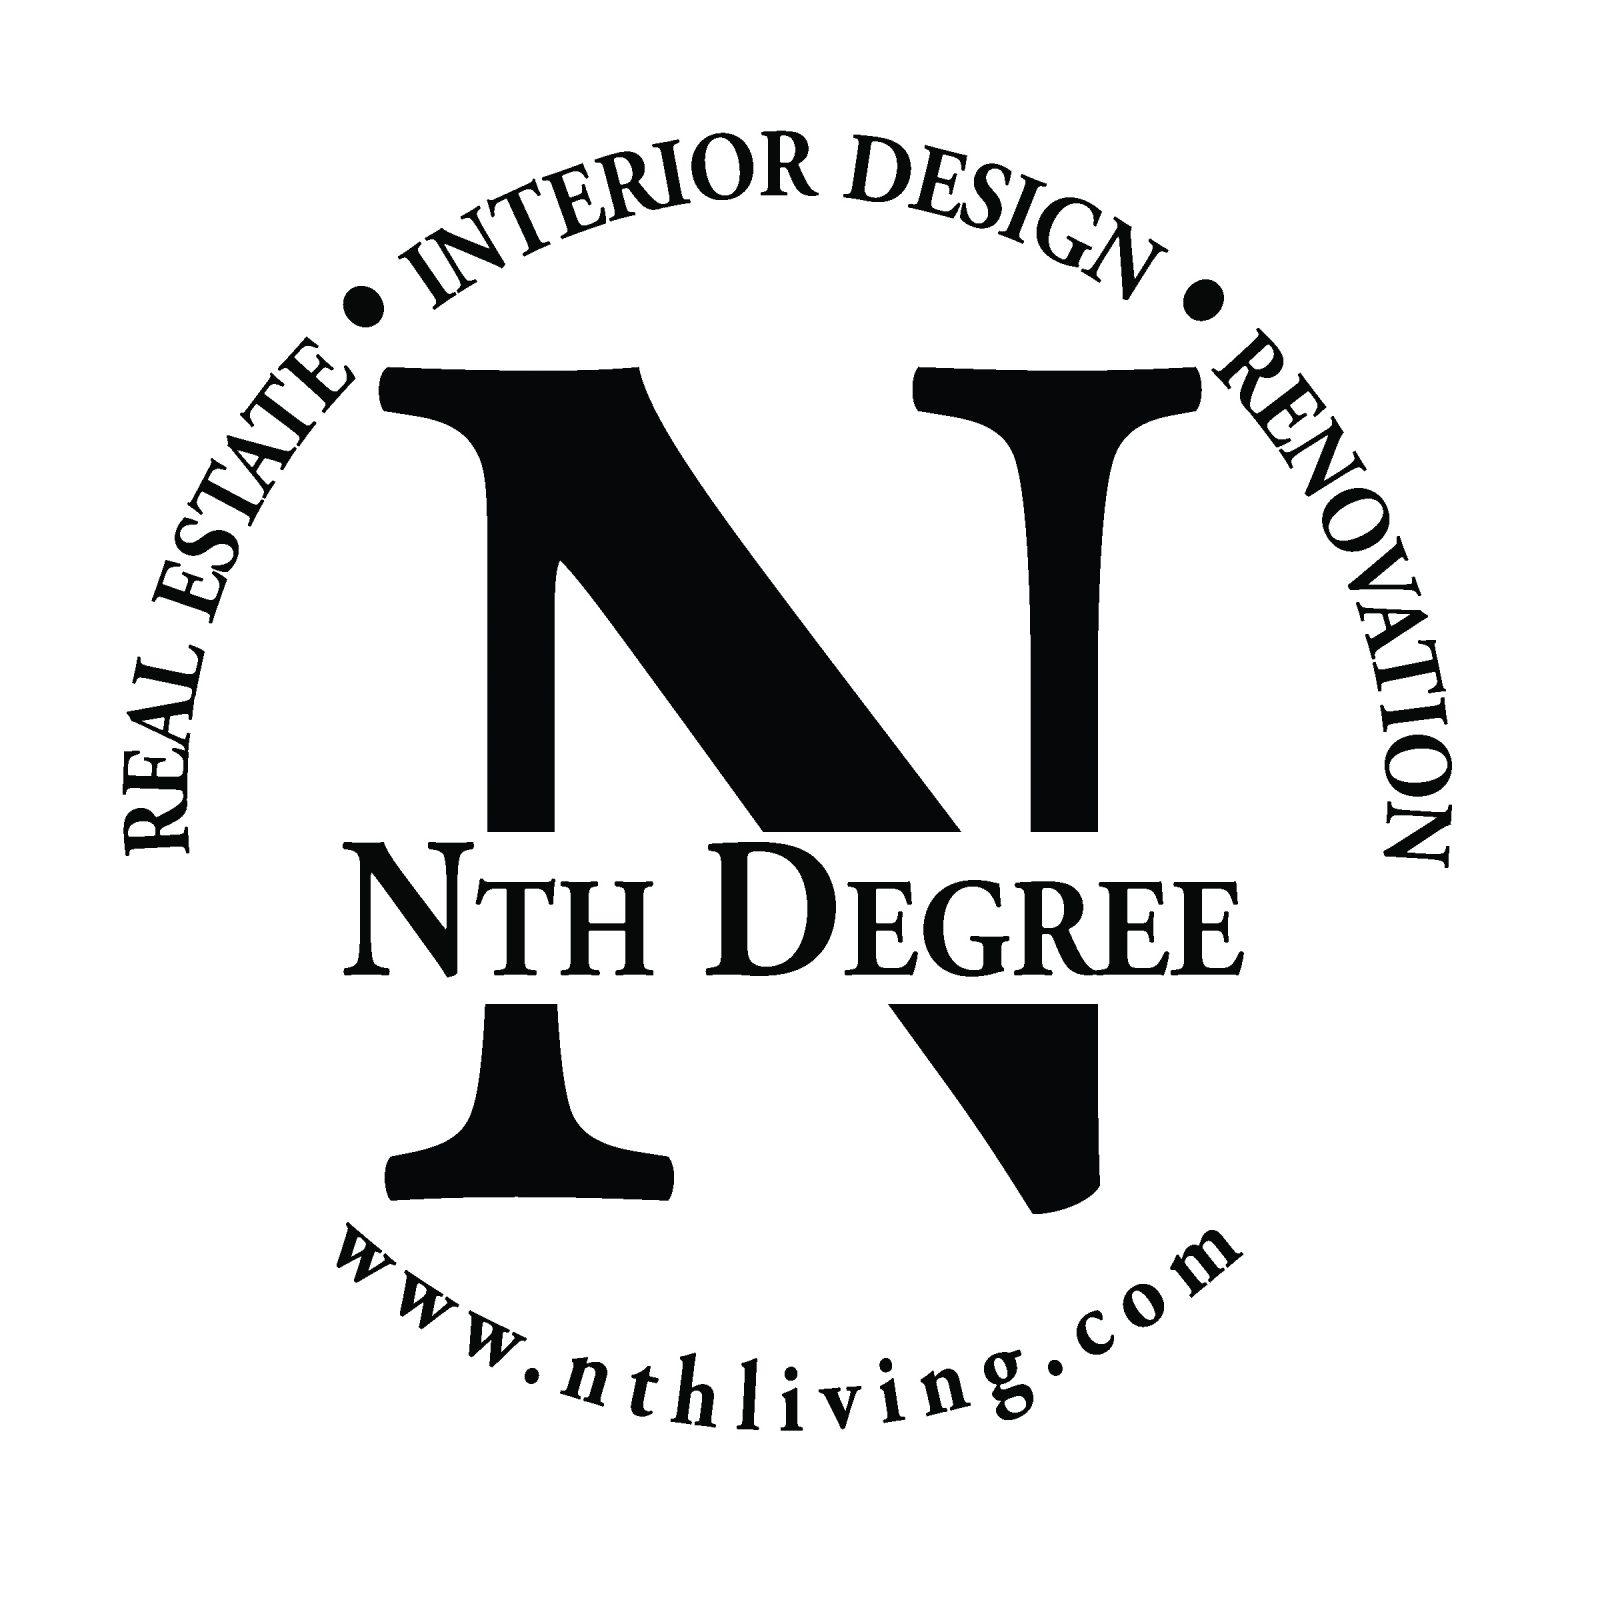 Nth Degree Interior Design and Renovation